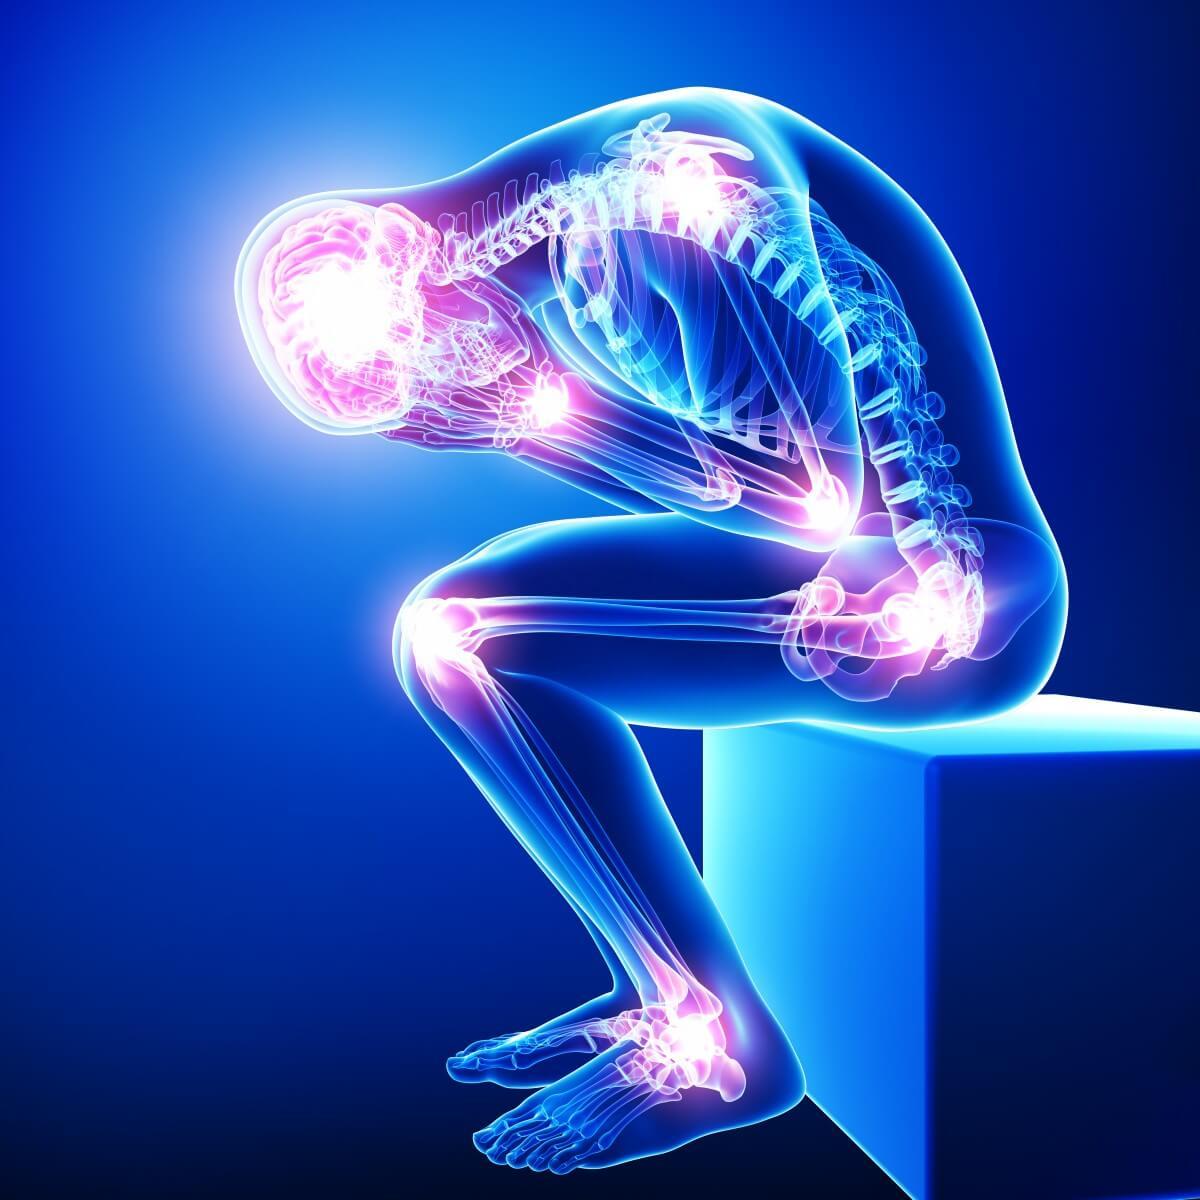 Fibromyalgia: Neurological Pain Disease